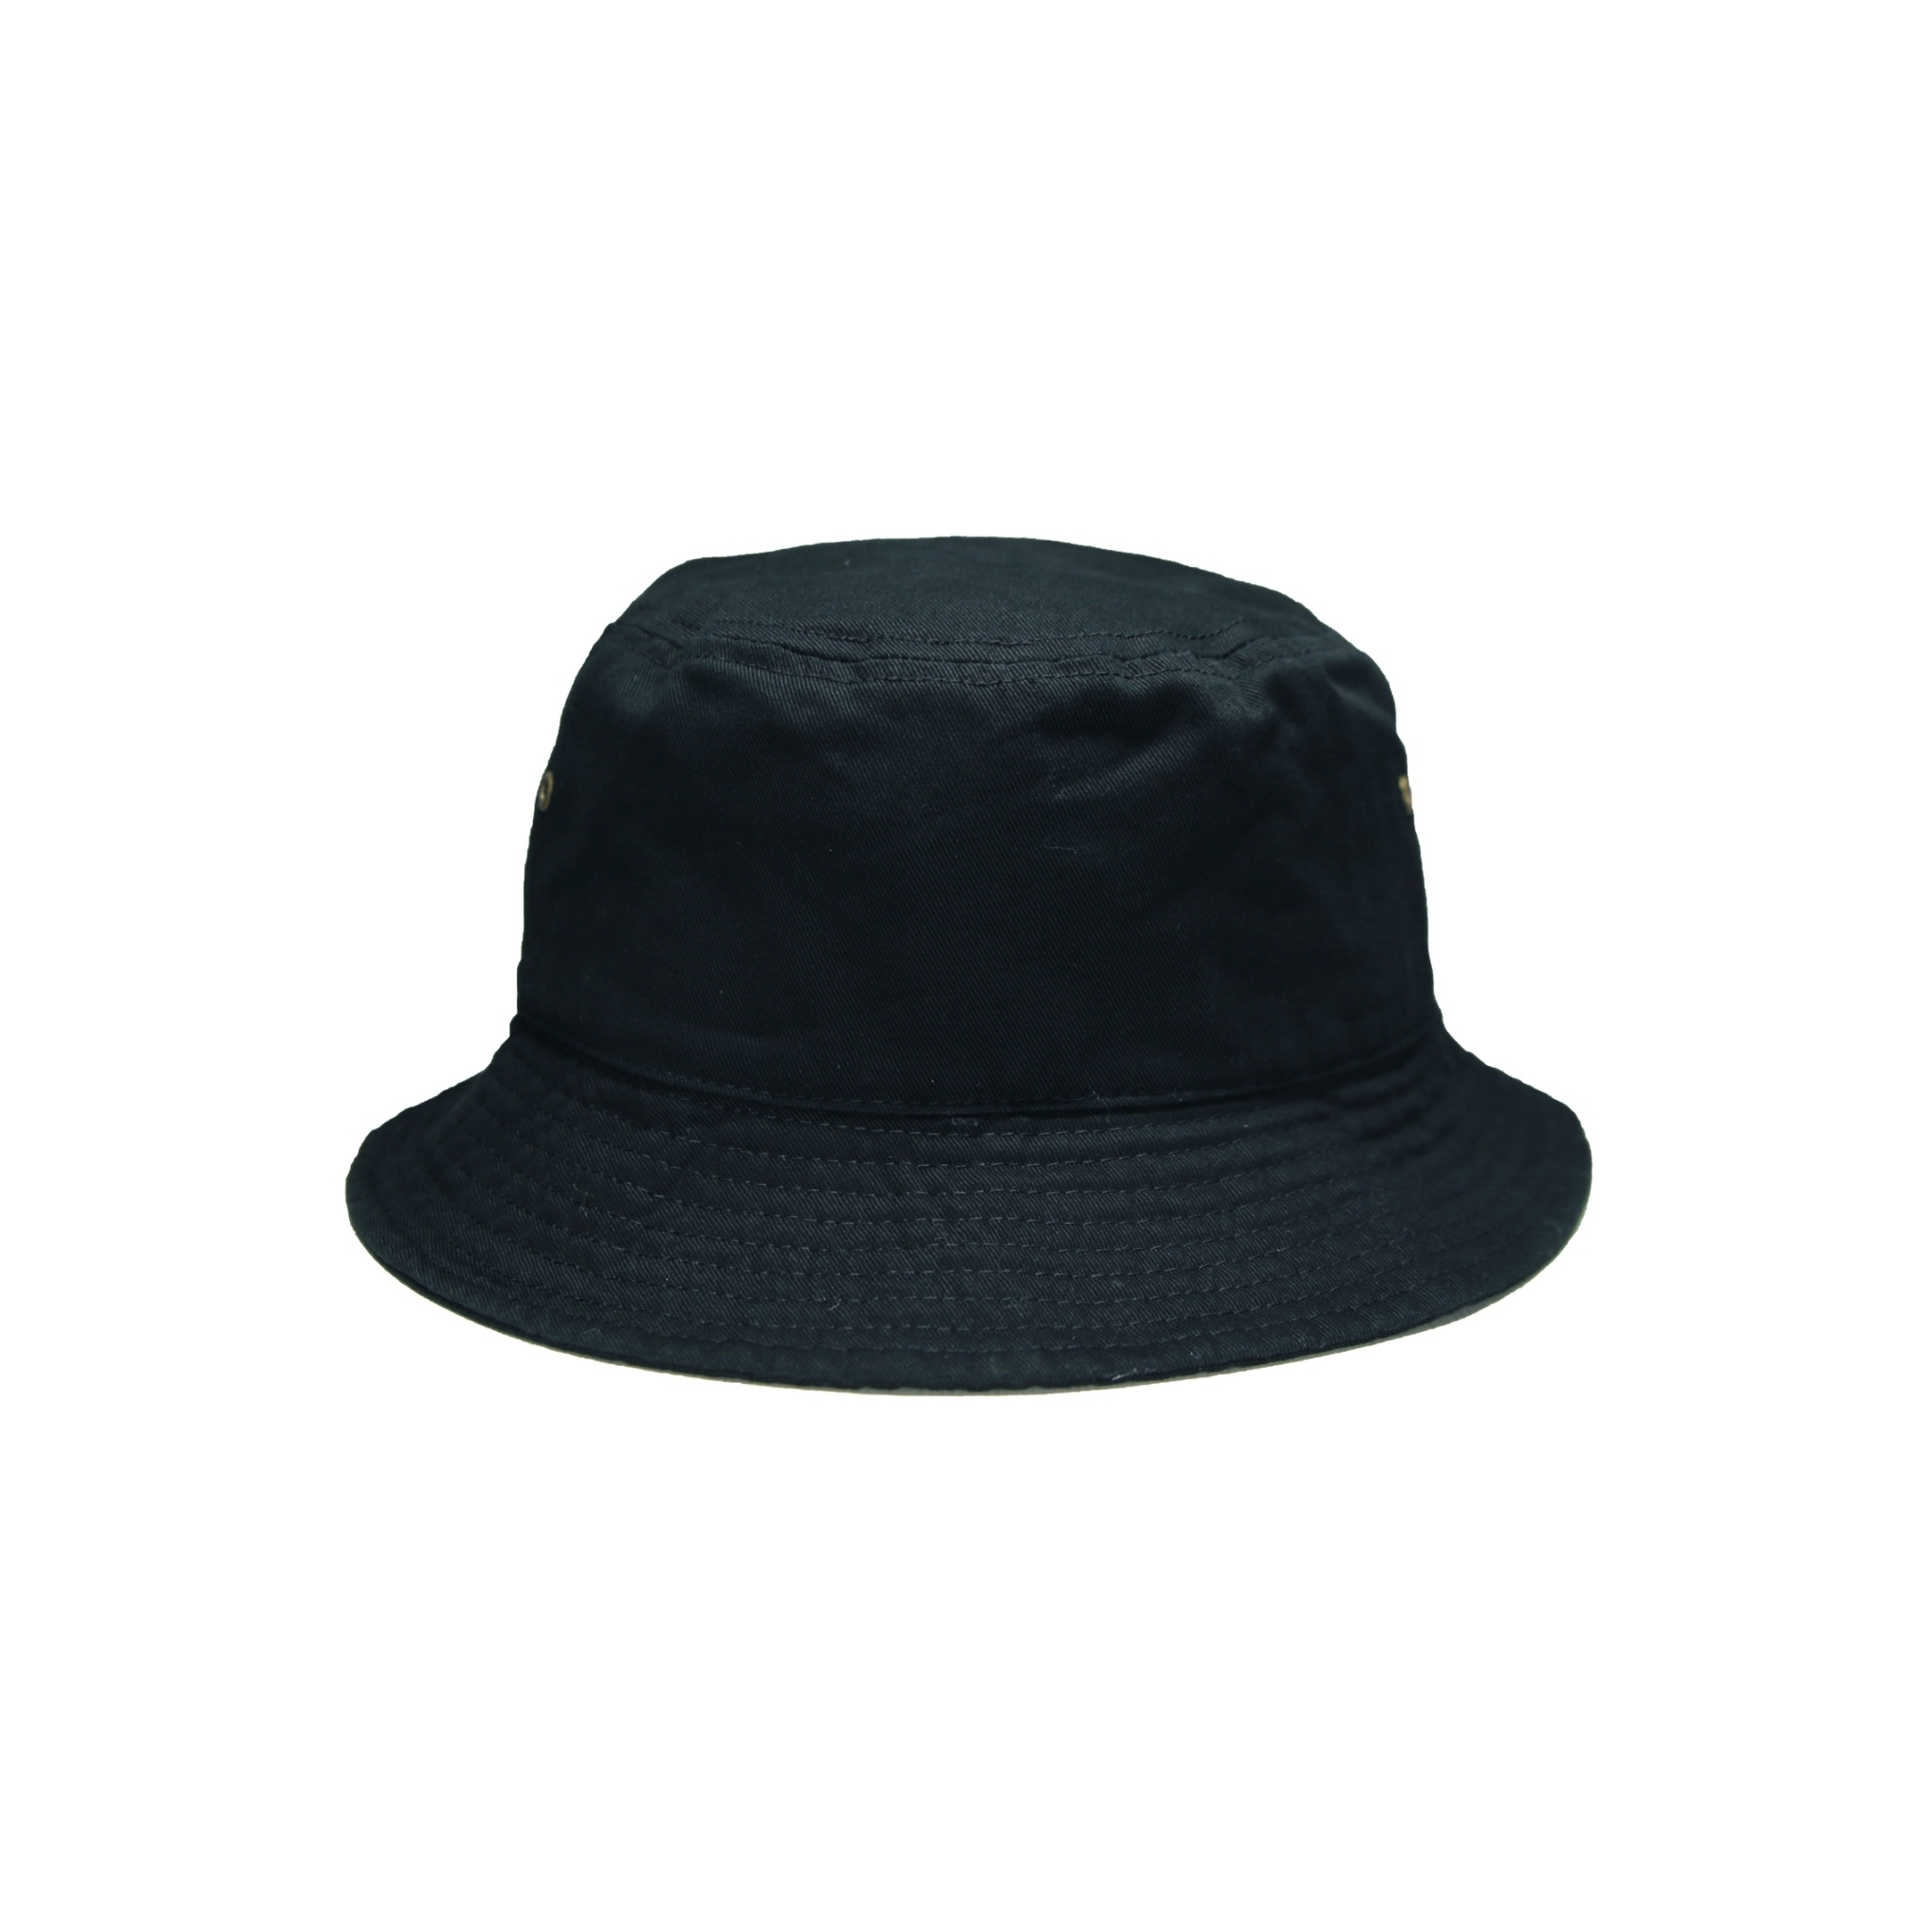 BW BUCKET HAT [BRED]